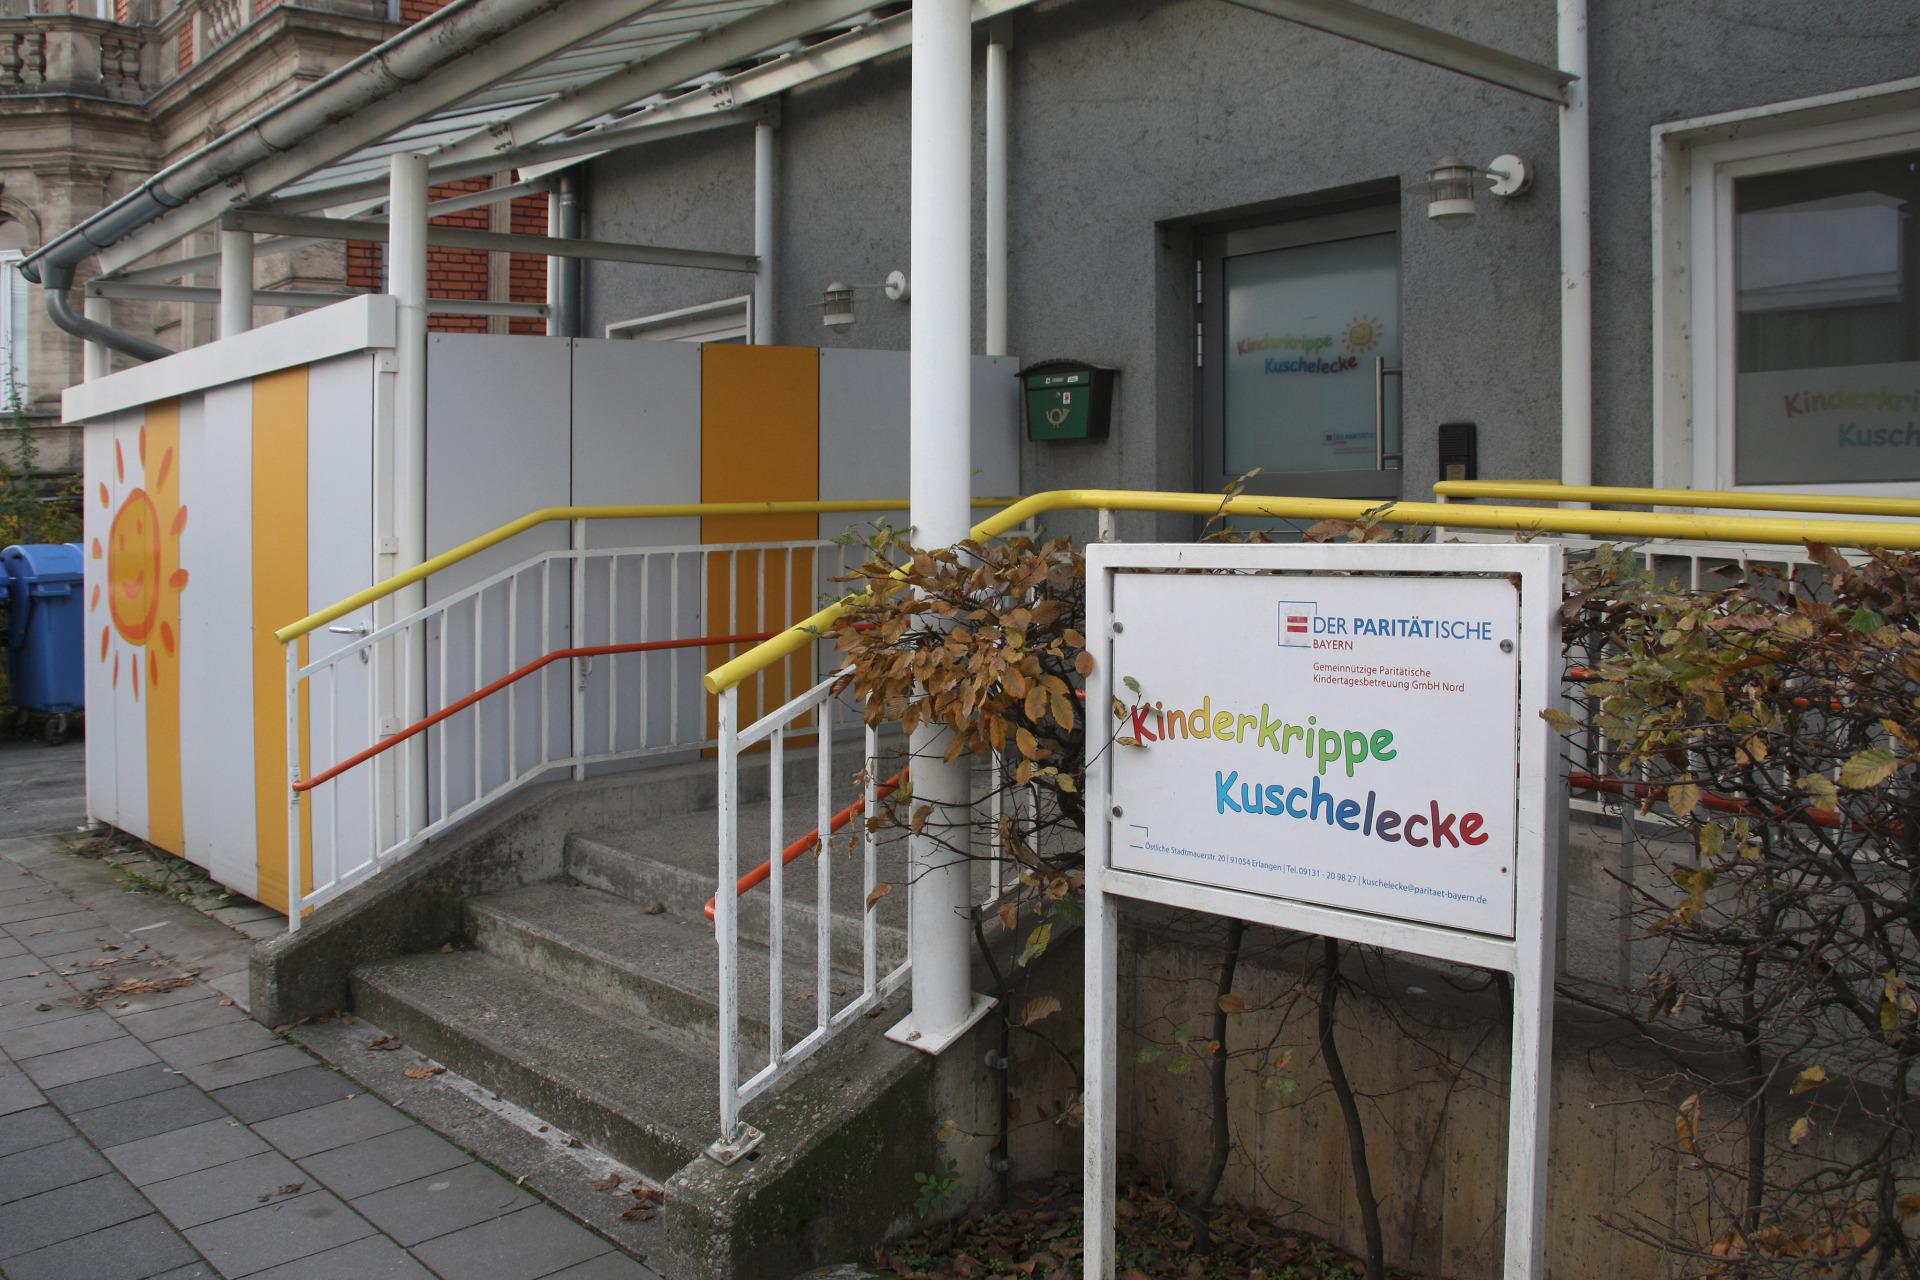 Kinderkrippe Kuschelecke 91054 Erlangen Paritatische Kita